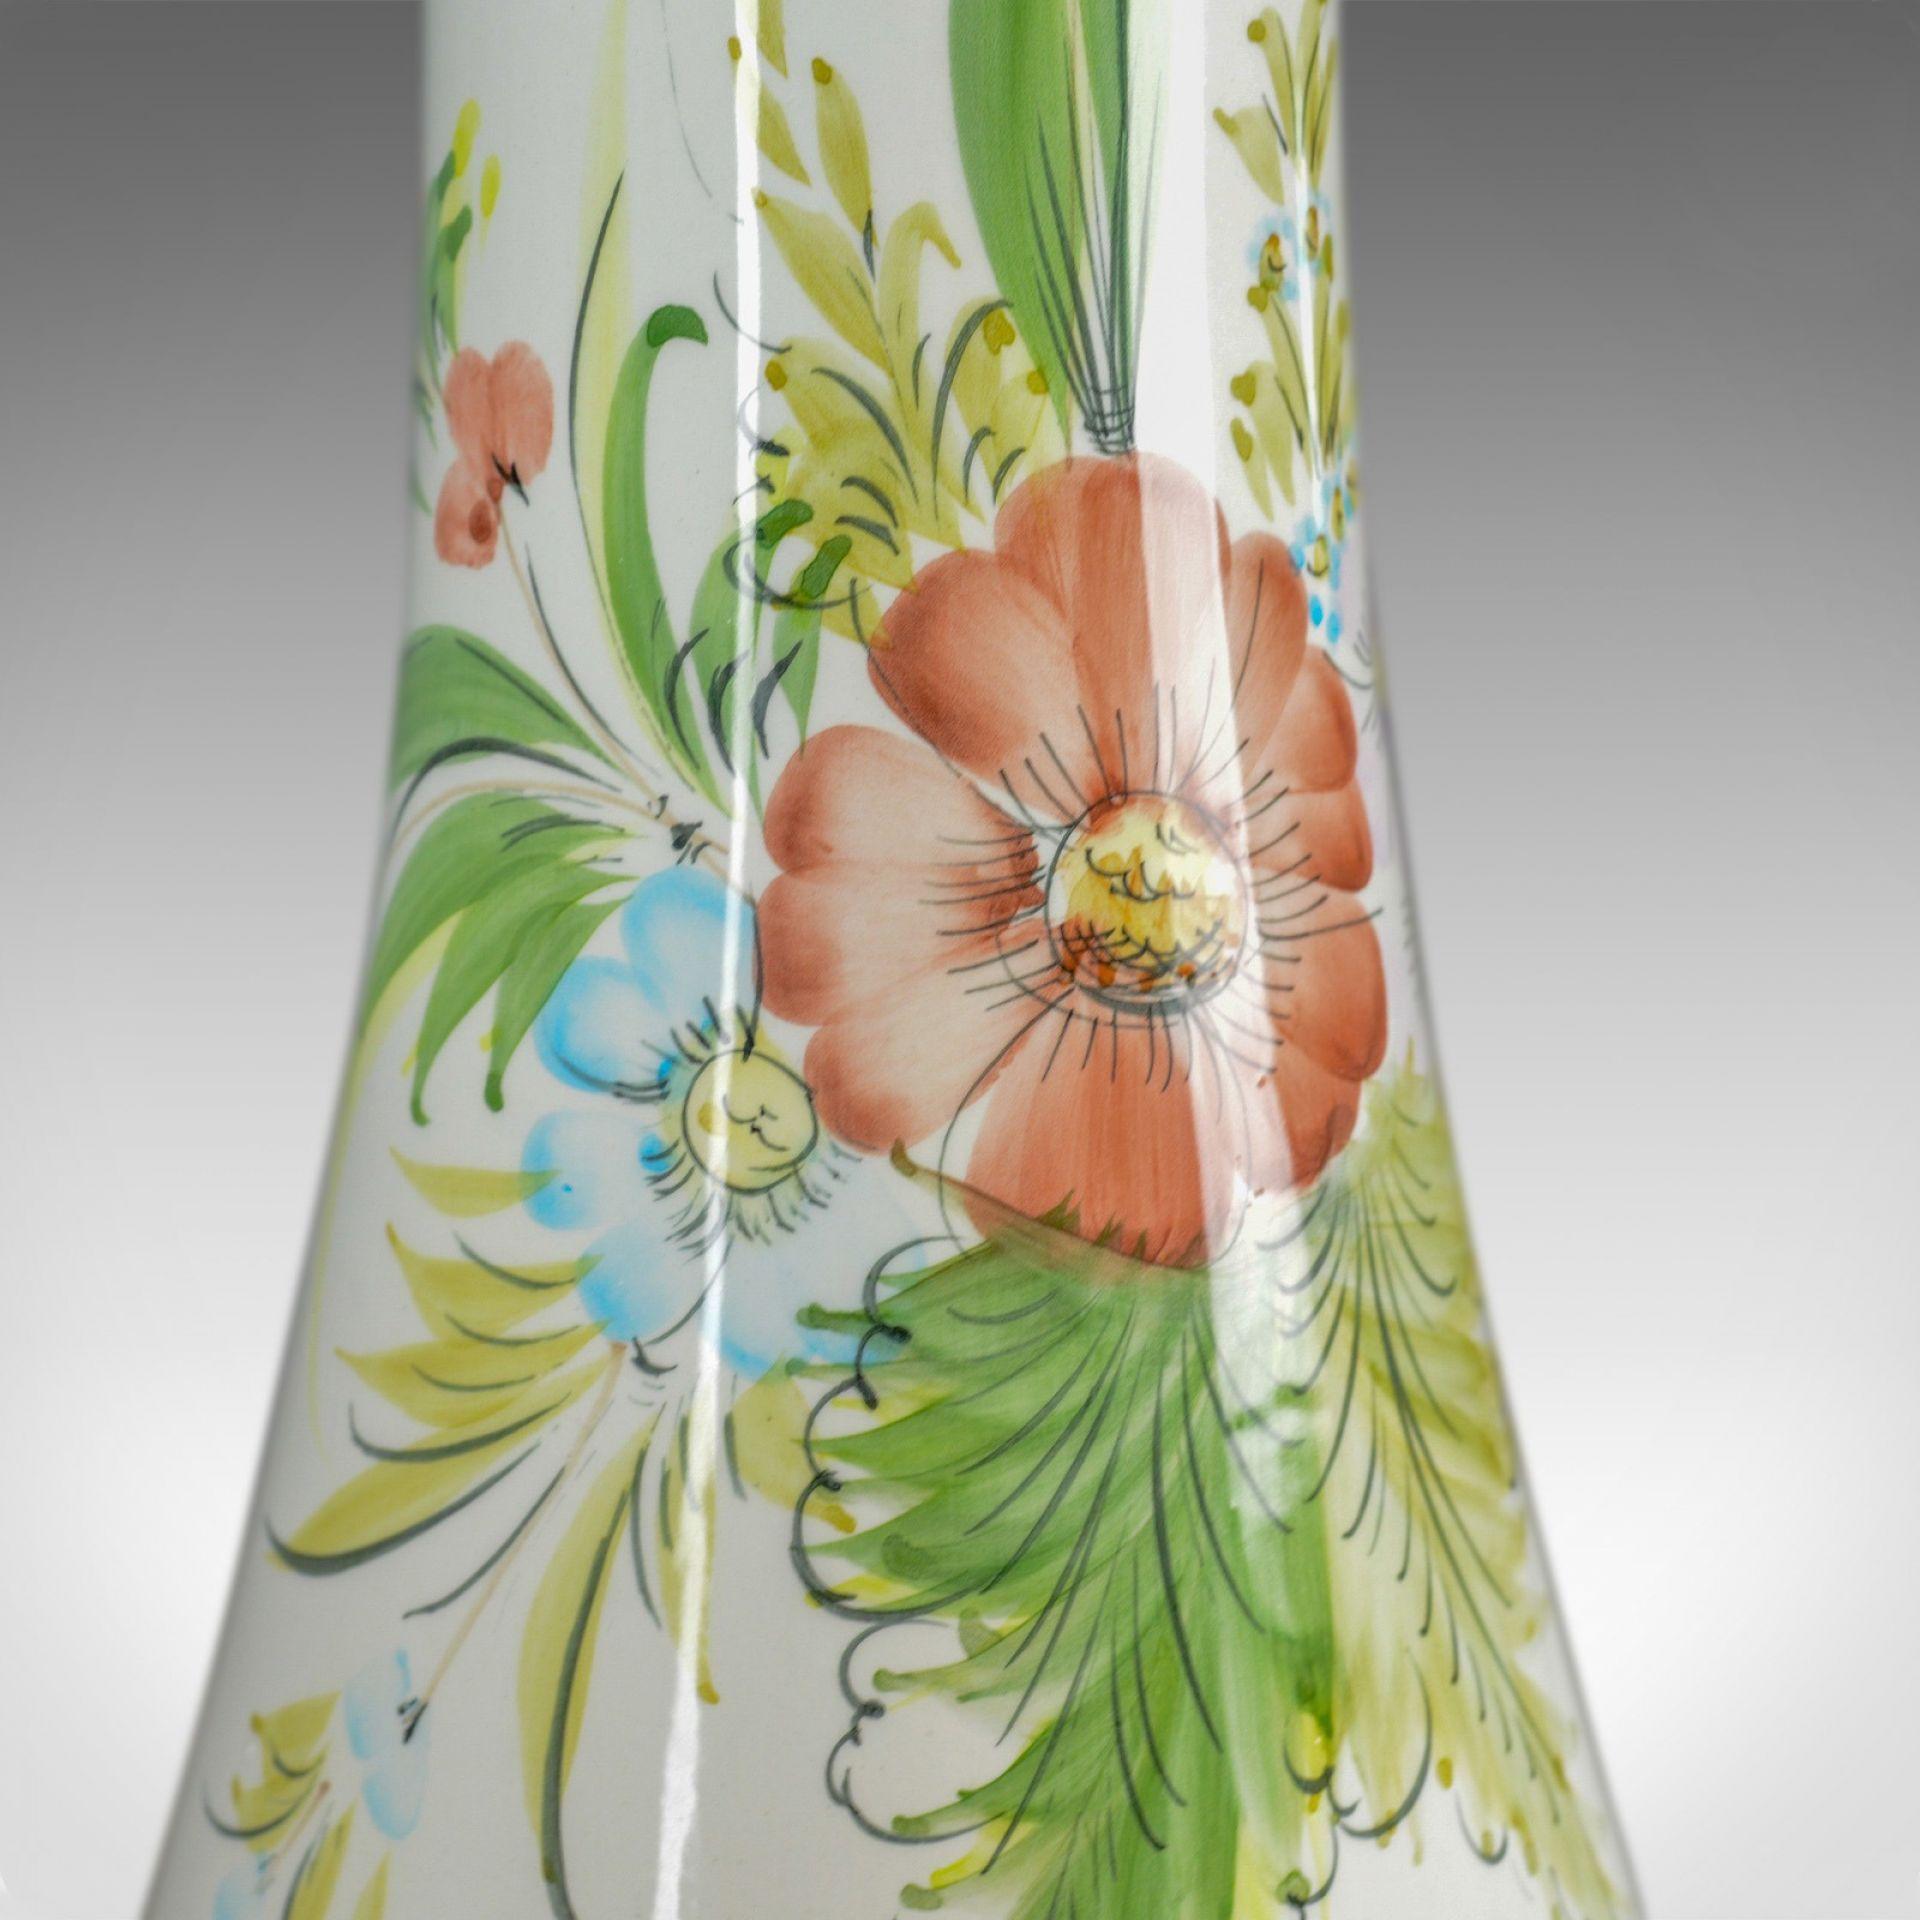 Vintage Ceramic Jardiniere, Floral, Portuguese, Cercapia, Late C20th